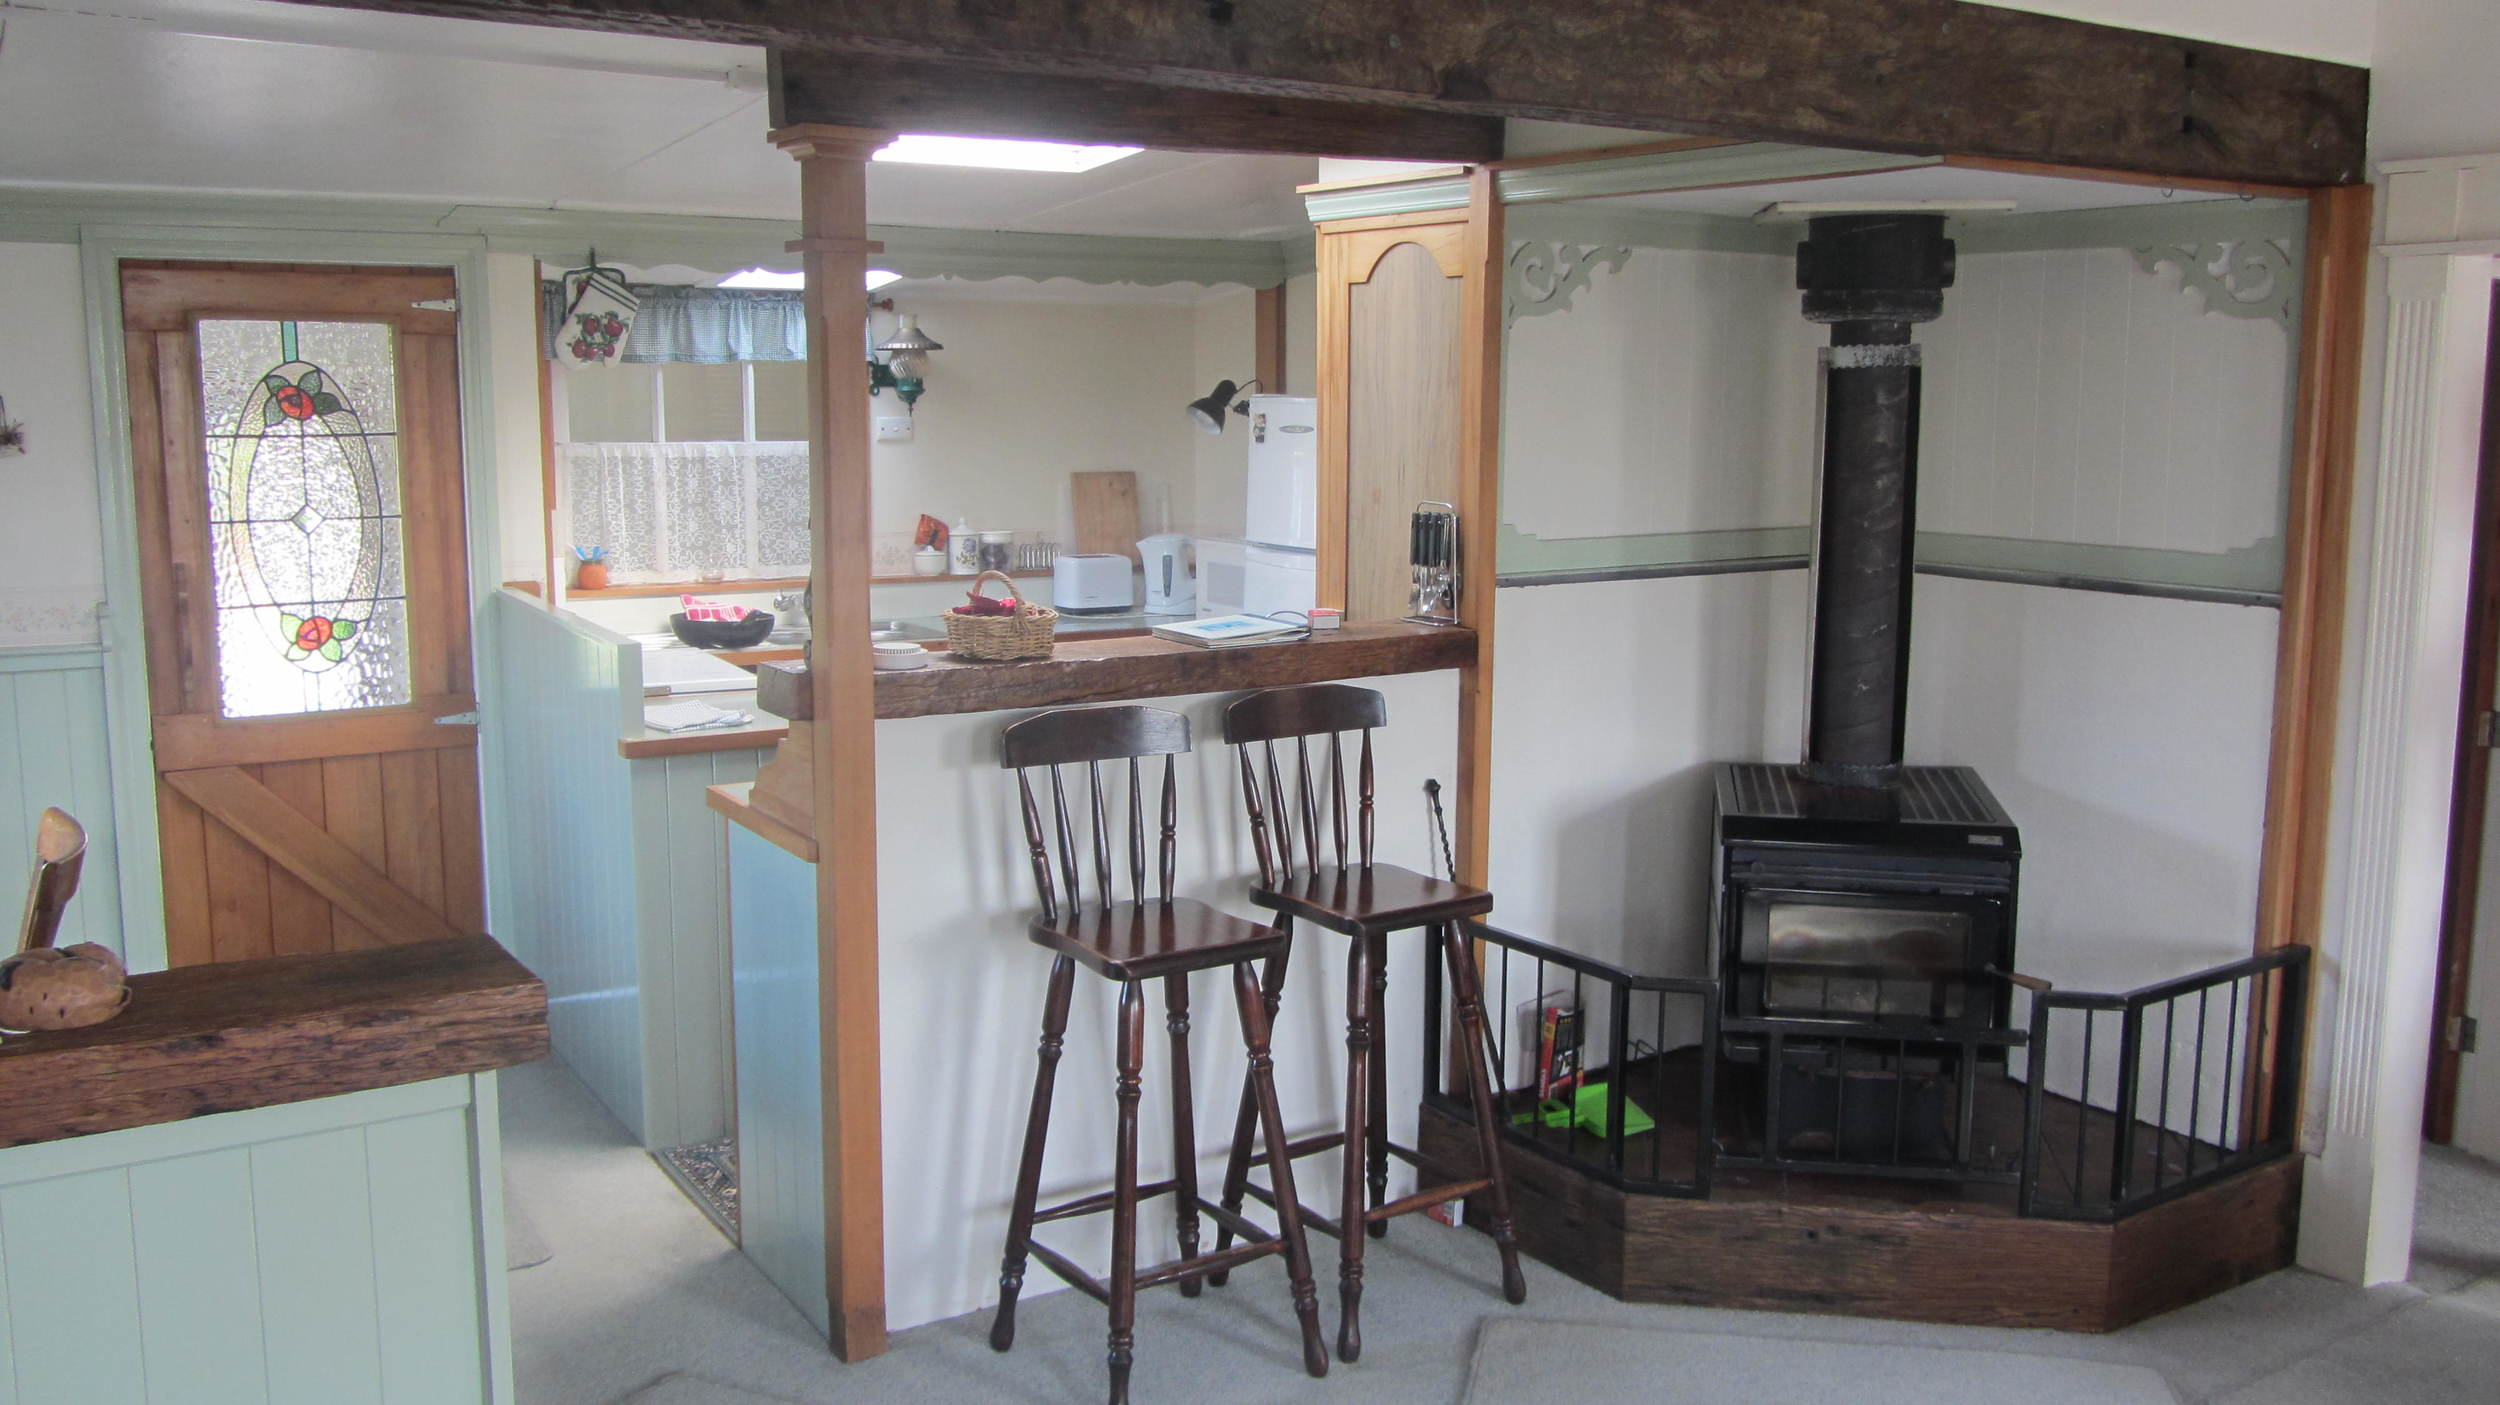 Maggies Accomodation in Kumara. Clean, Cosy, Comfy.